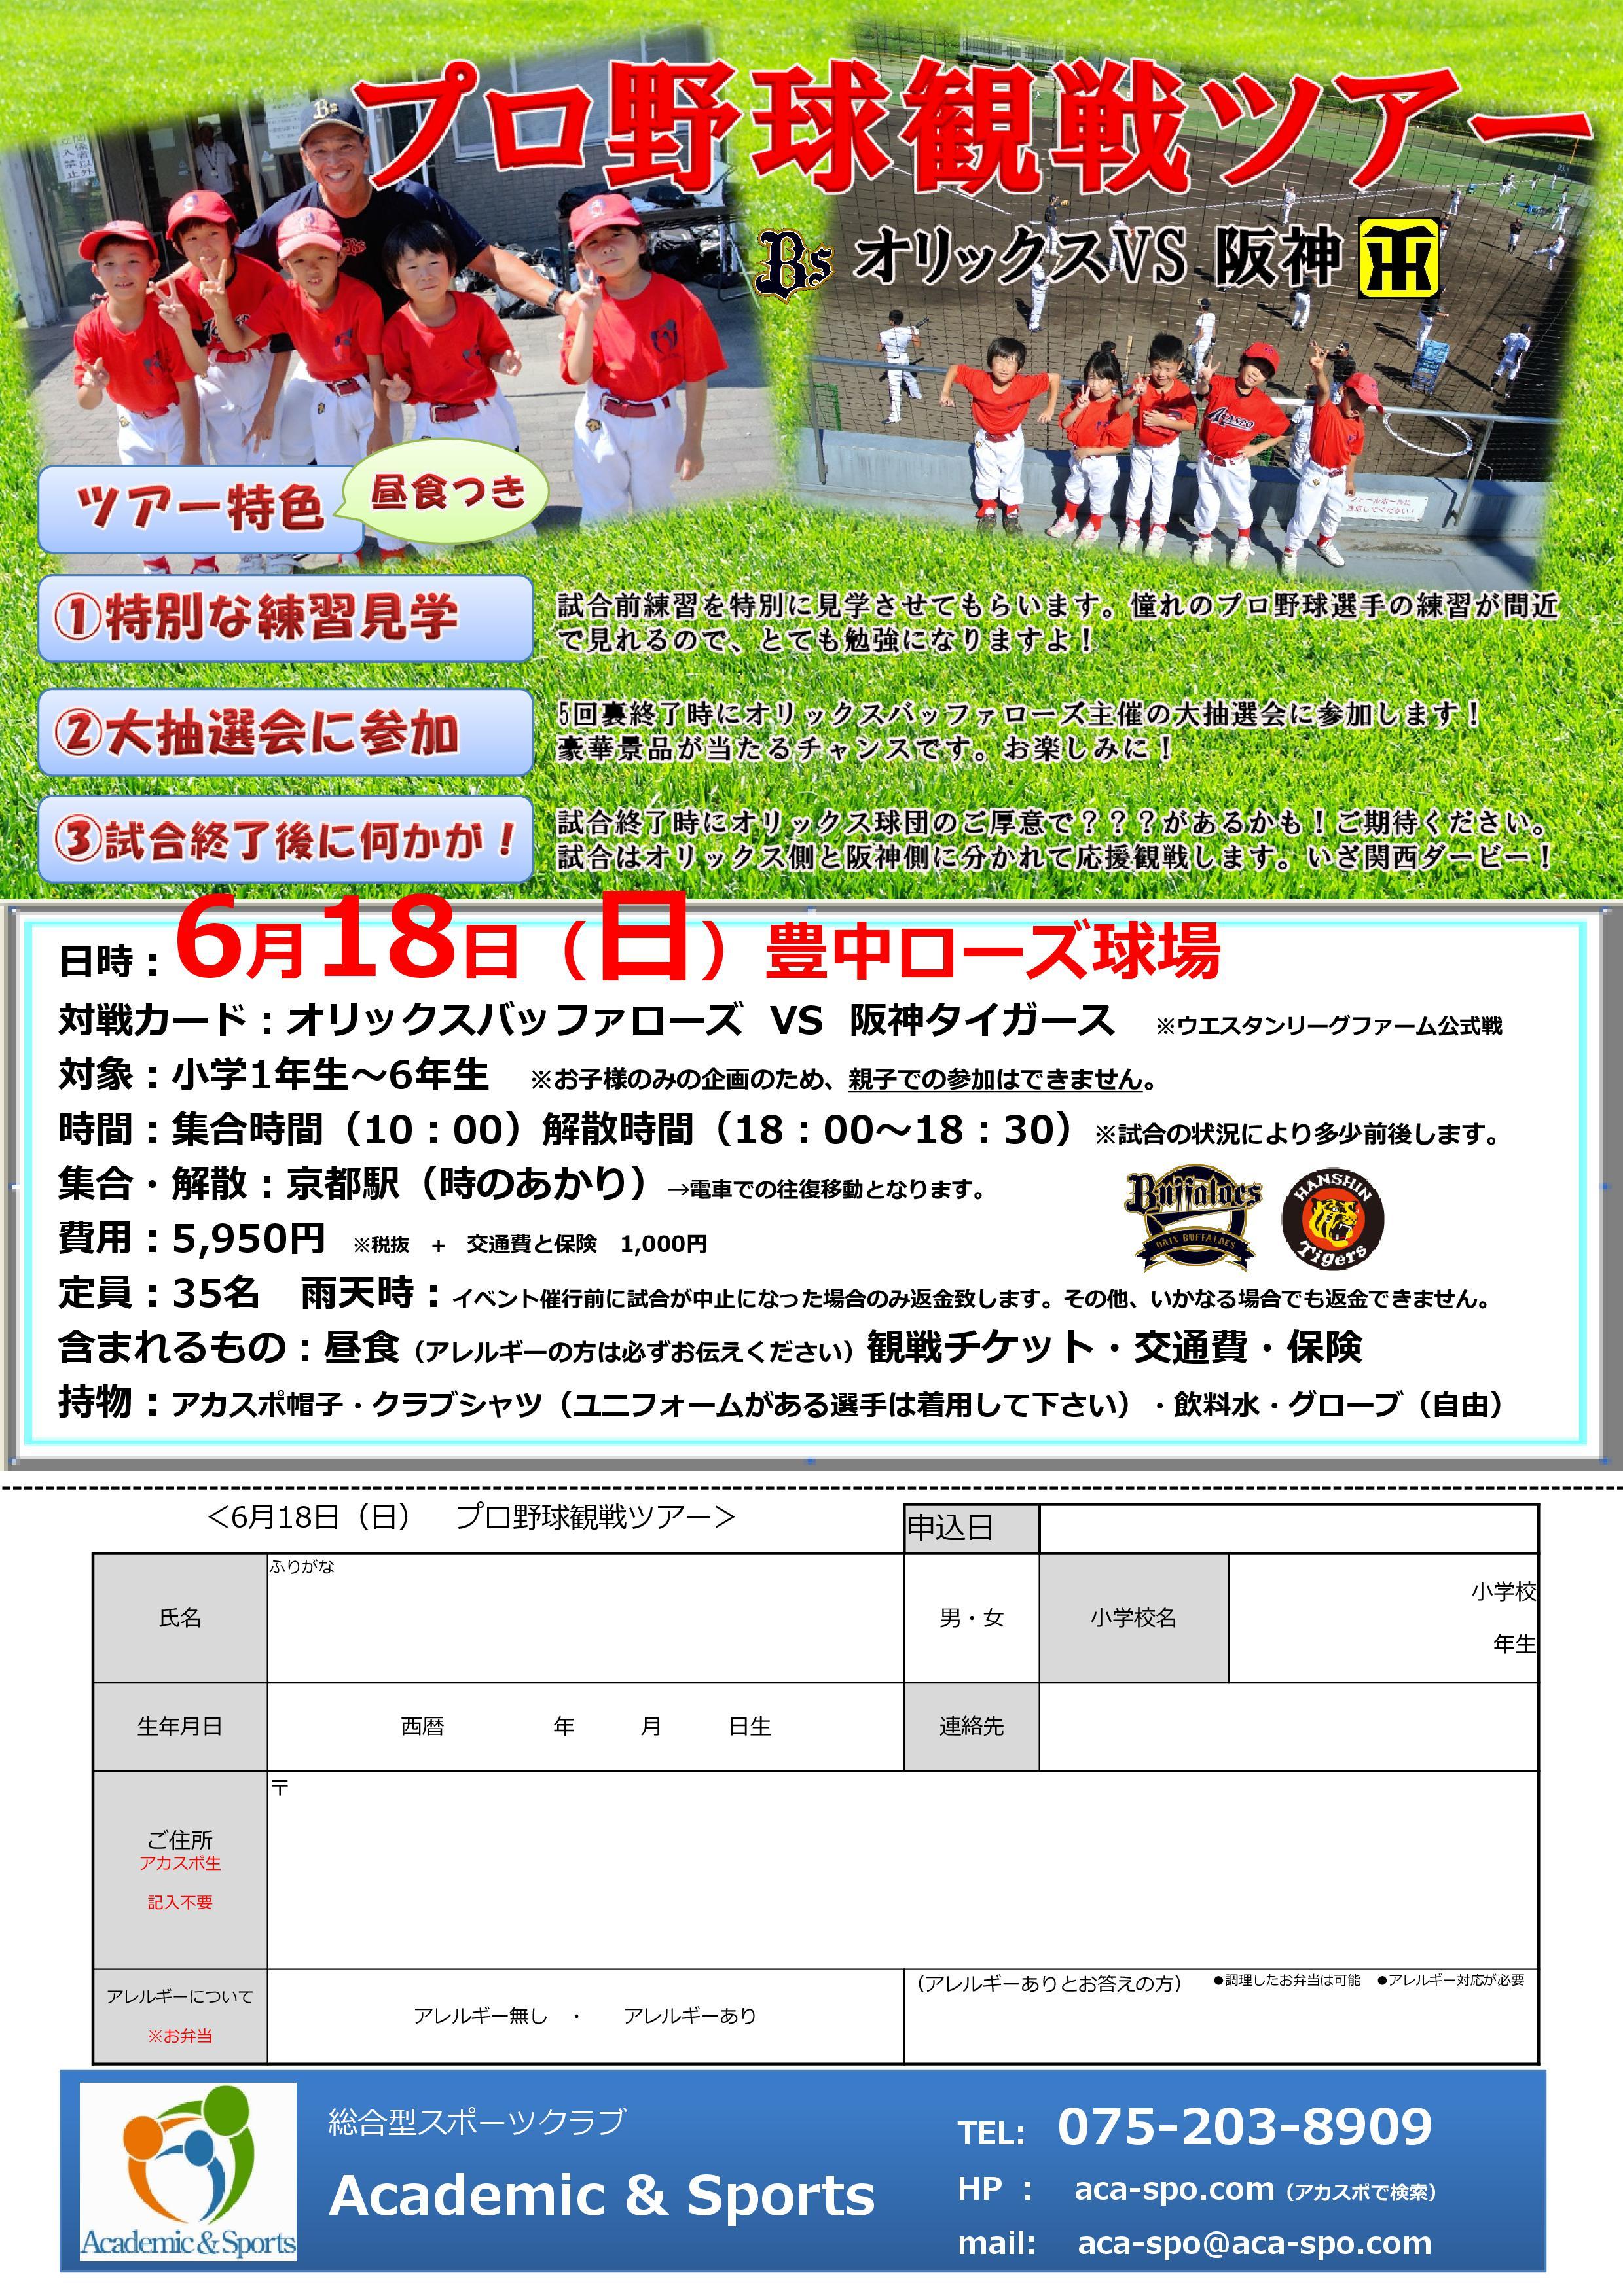 Microsoft PowerPoint - プロ野球観戦ツアー